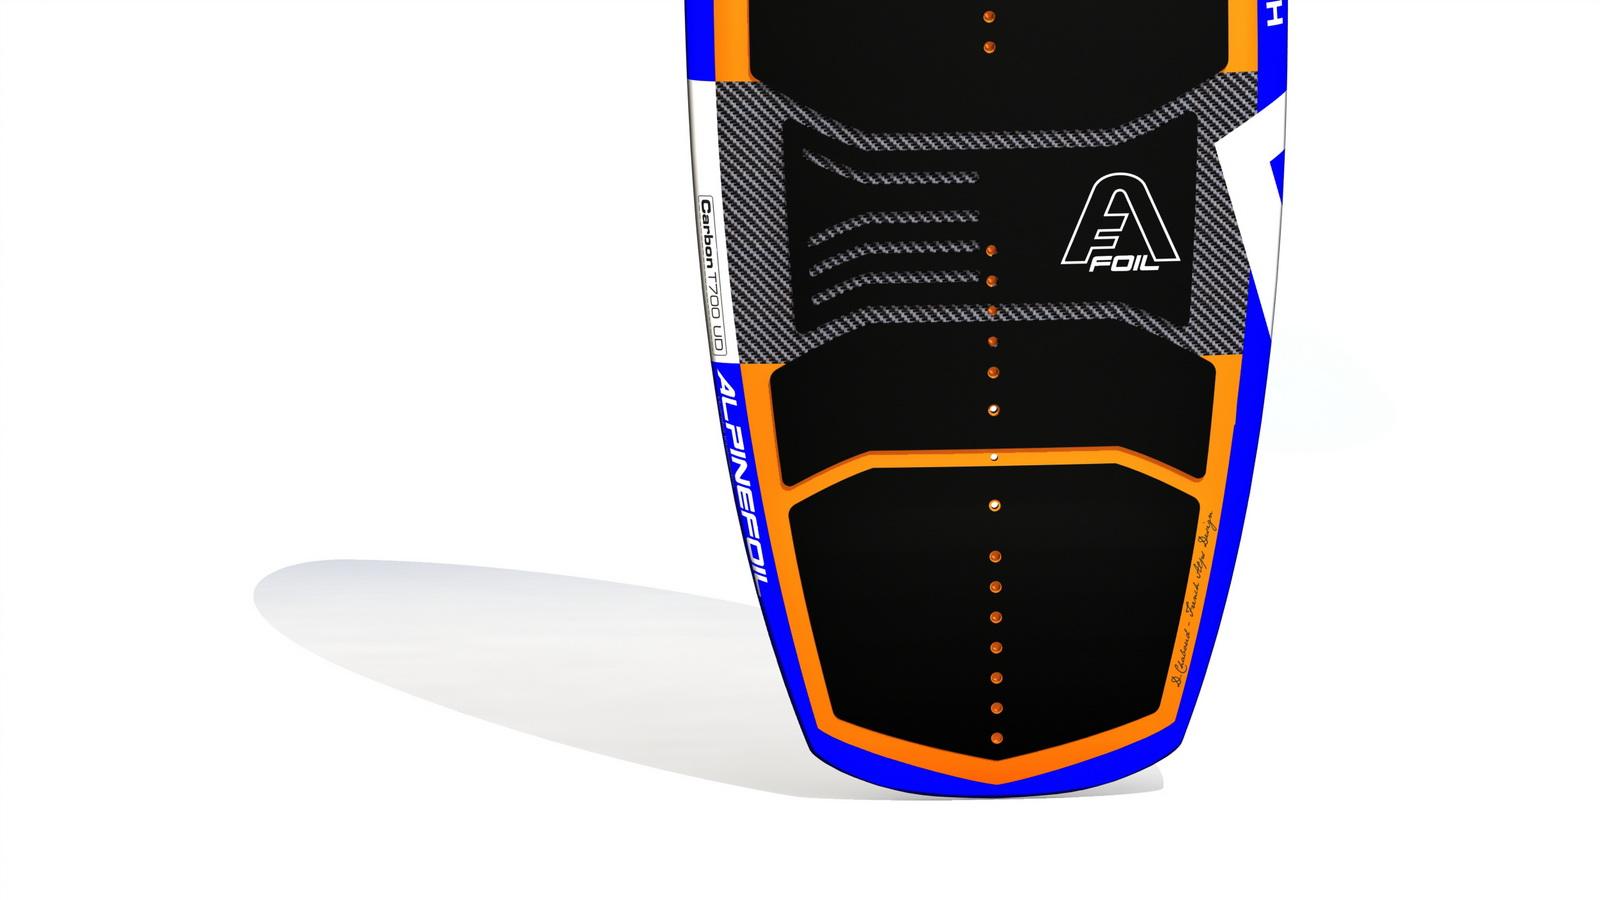 Kitefoil foilboard alpinefoil cx v6s wave 2